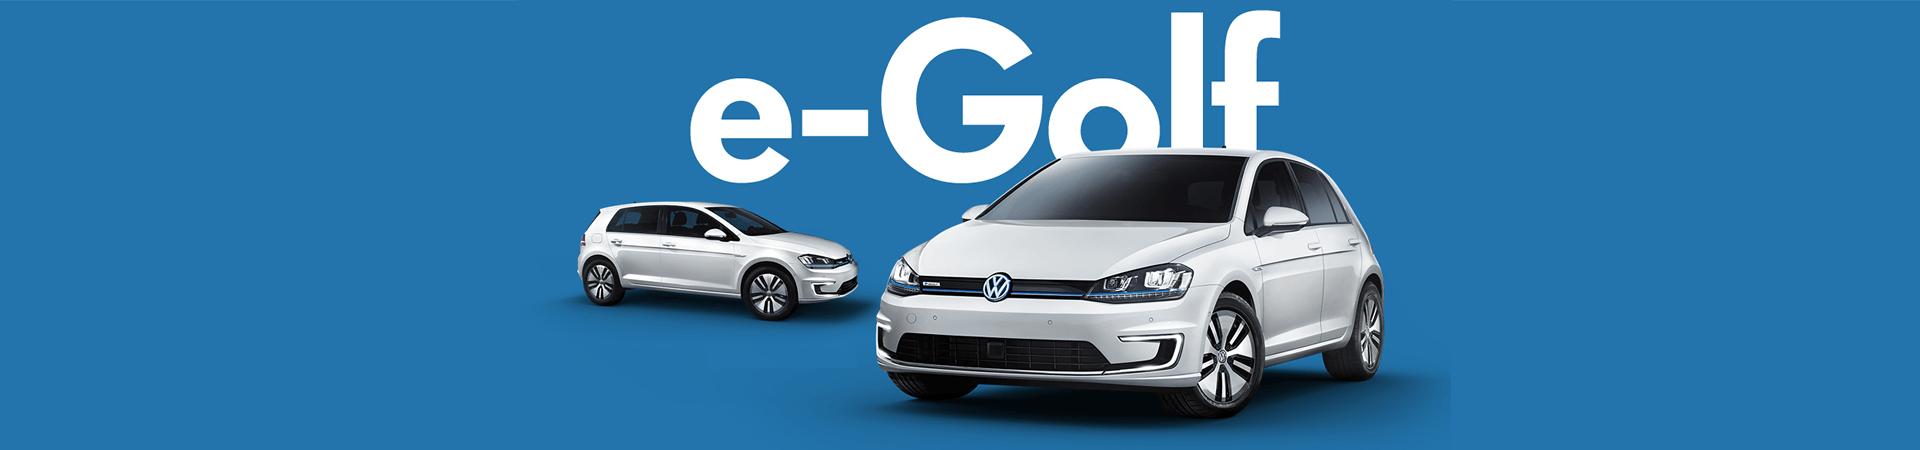 Volkswagen e-Golf Header Image